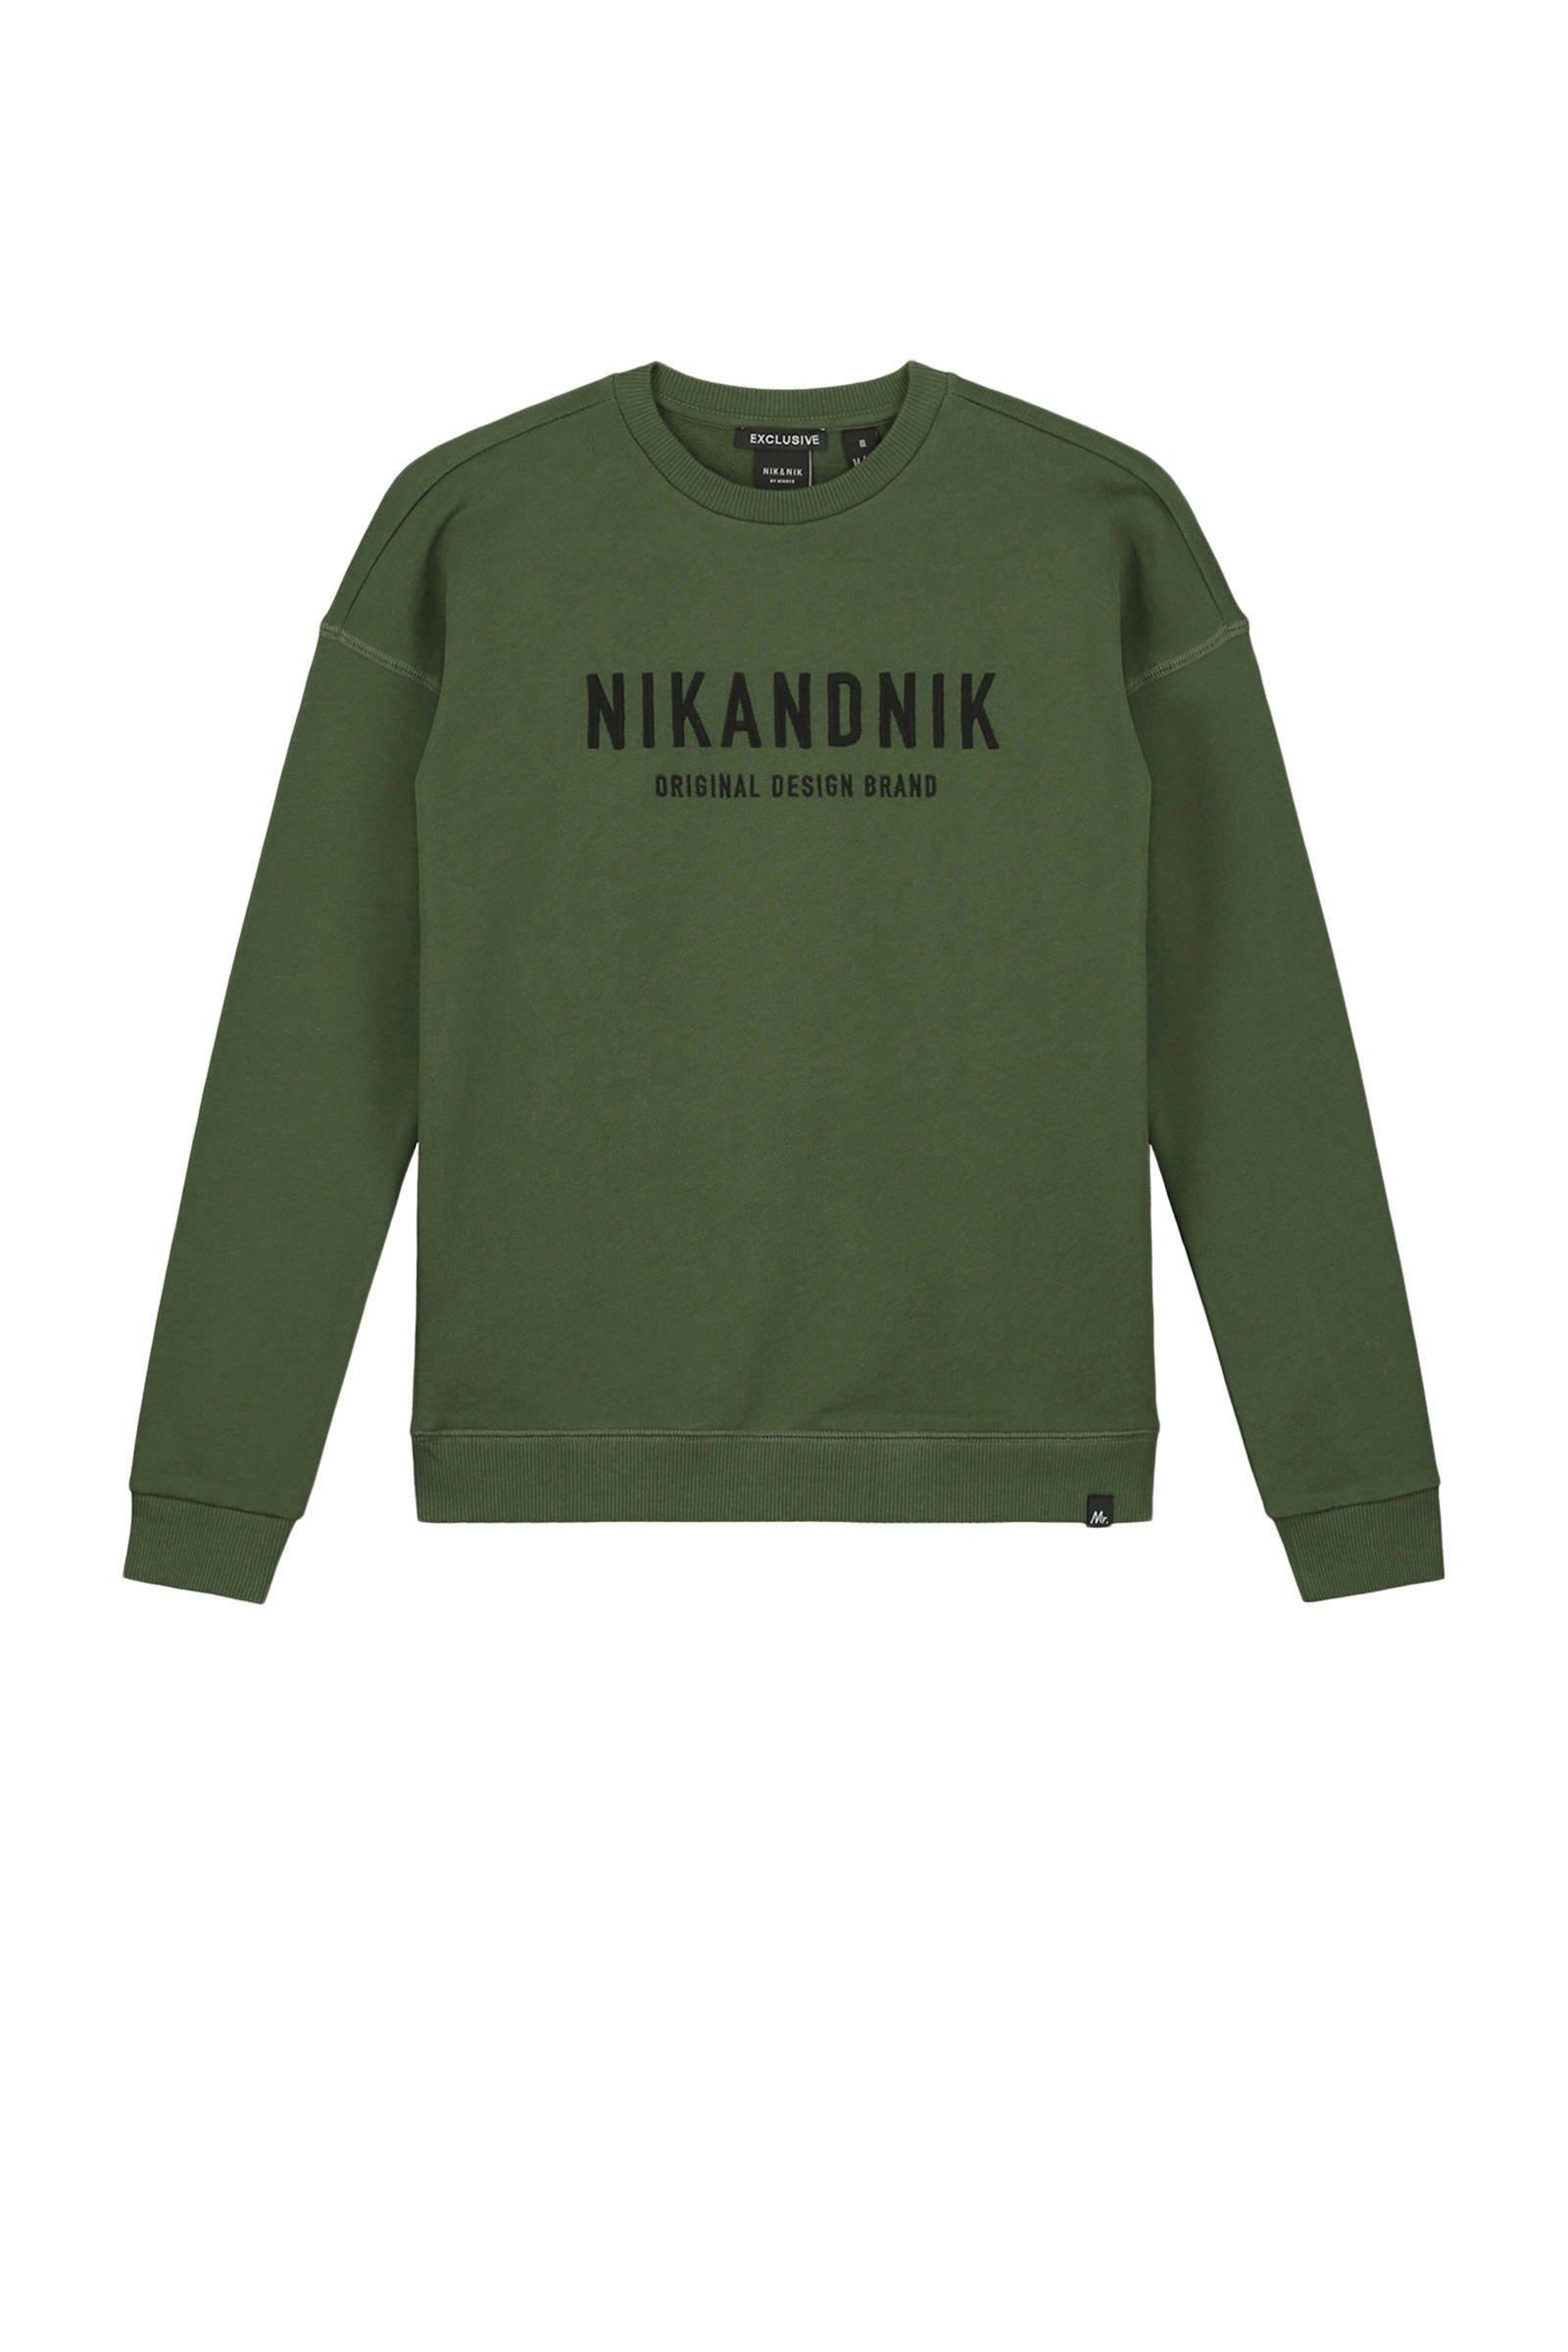 NIK&NIK sweater Milo met logo mosgroen - maat 152